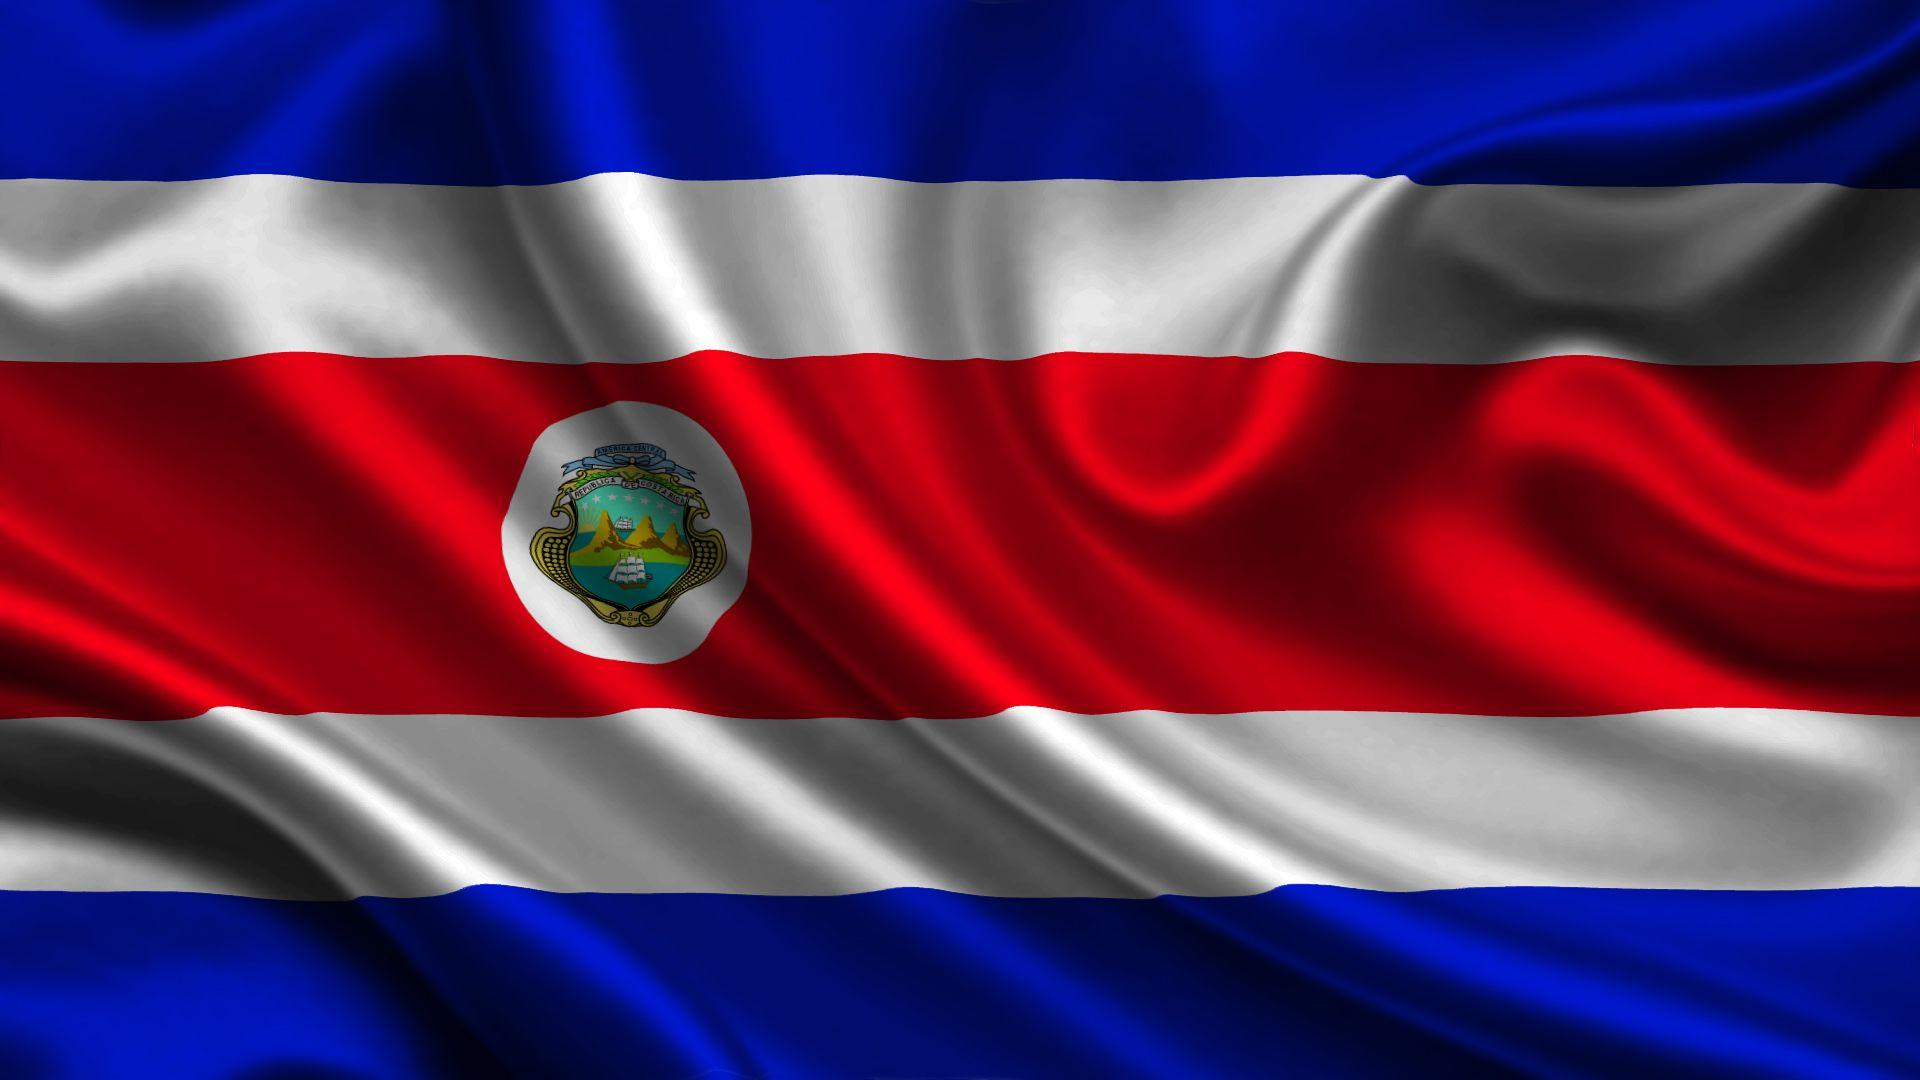 Costa Rica National Football Team Background 6